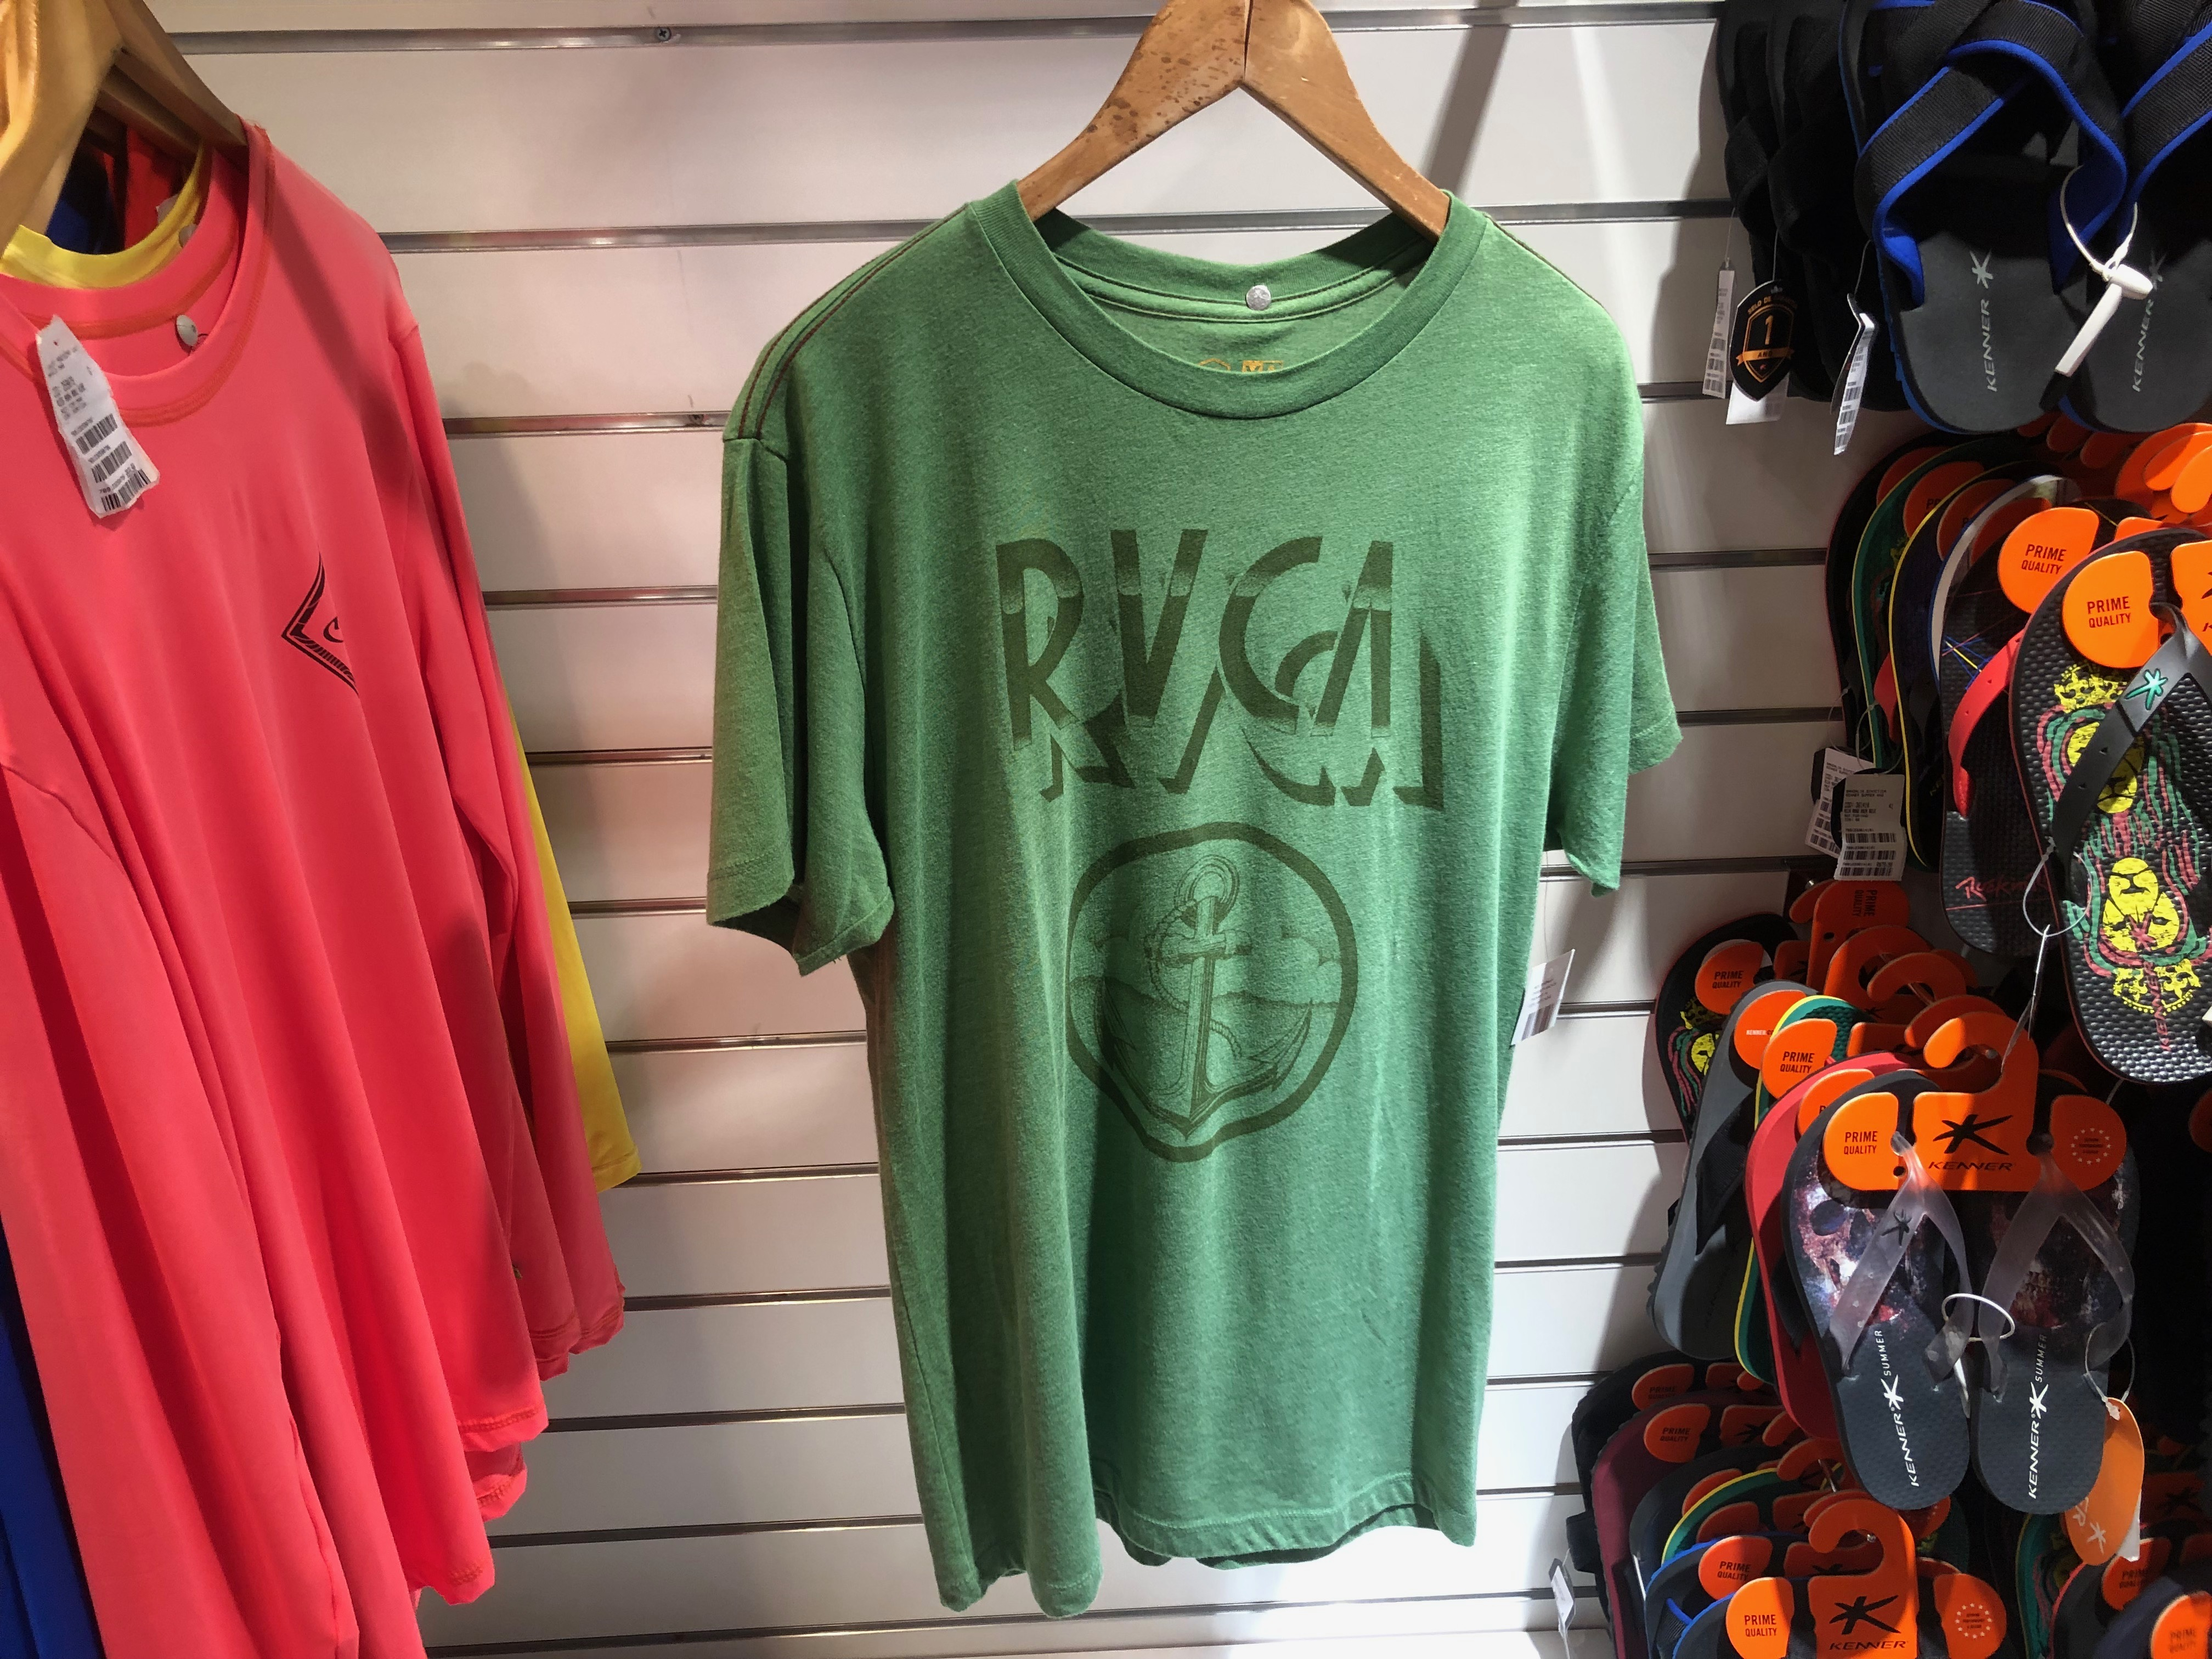 Camiseta verde RVCA (Mahalo -salvador Shopping) de R$ 110 por R$ 55 (50%)